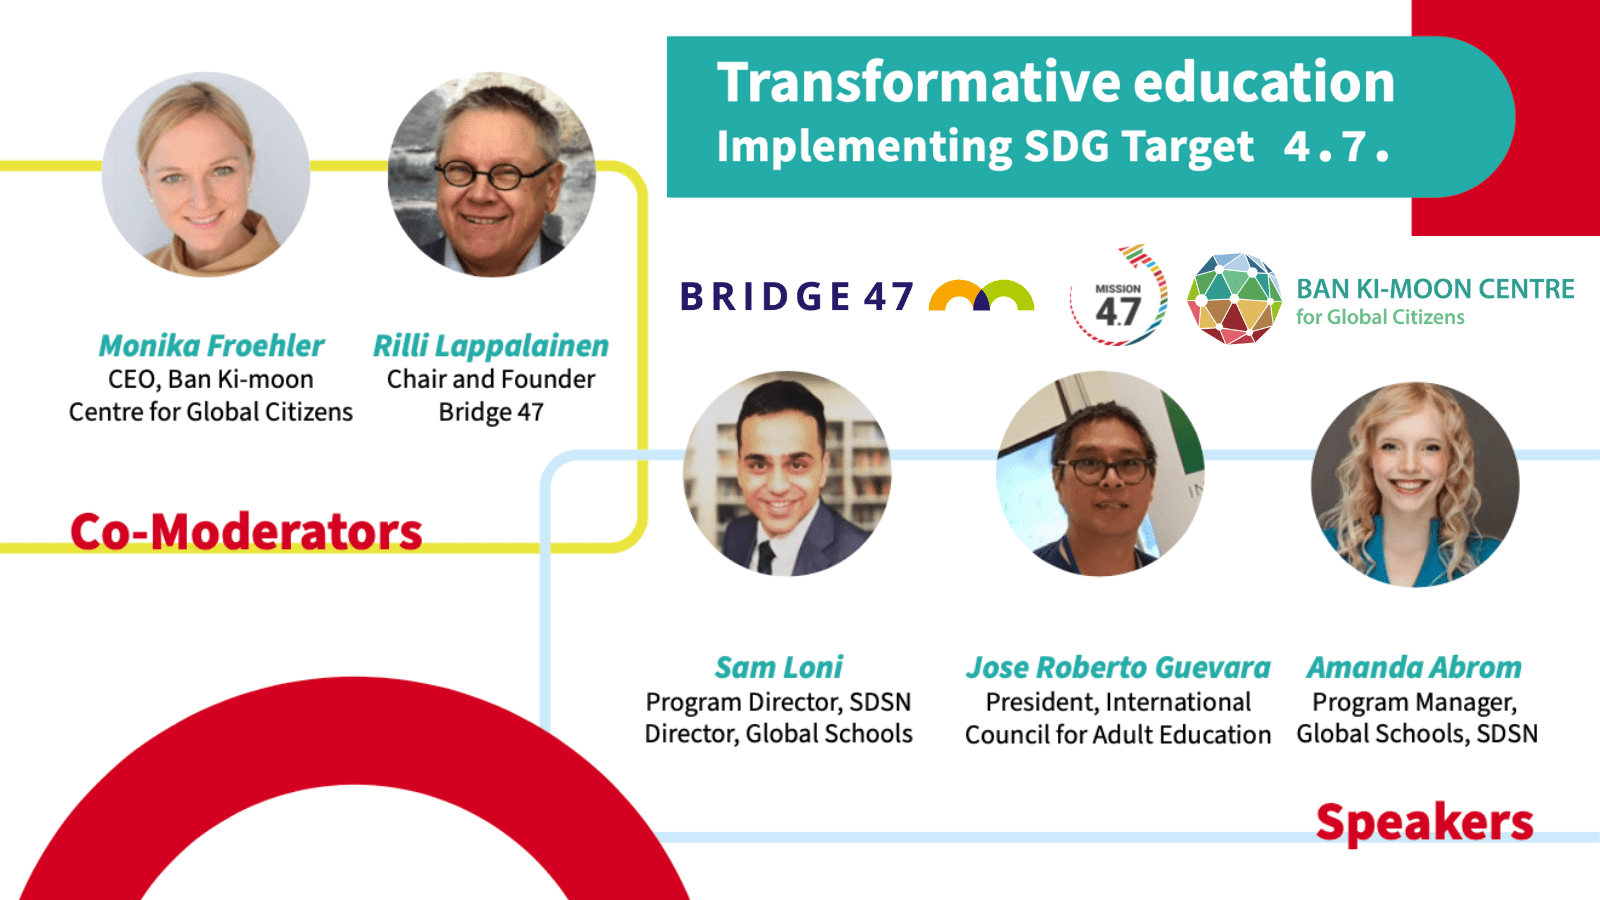 globalno učenje SLOGA Bridge 47 transformative education Global Citizenship Education Imagine 4.7